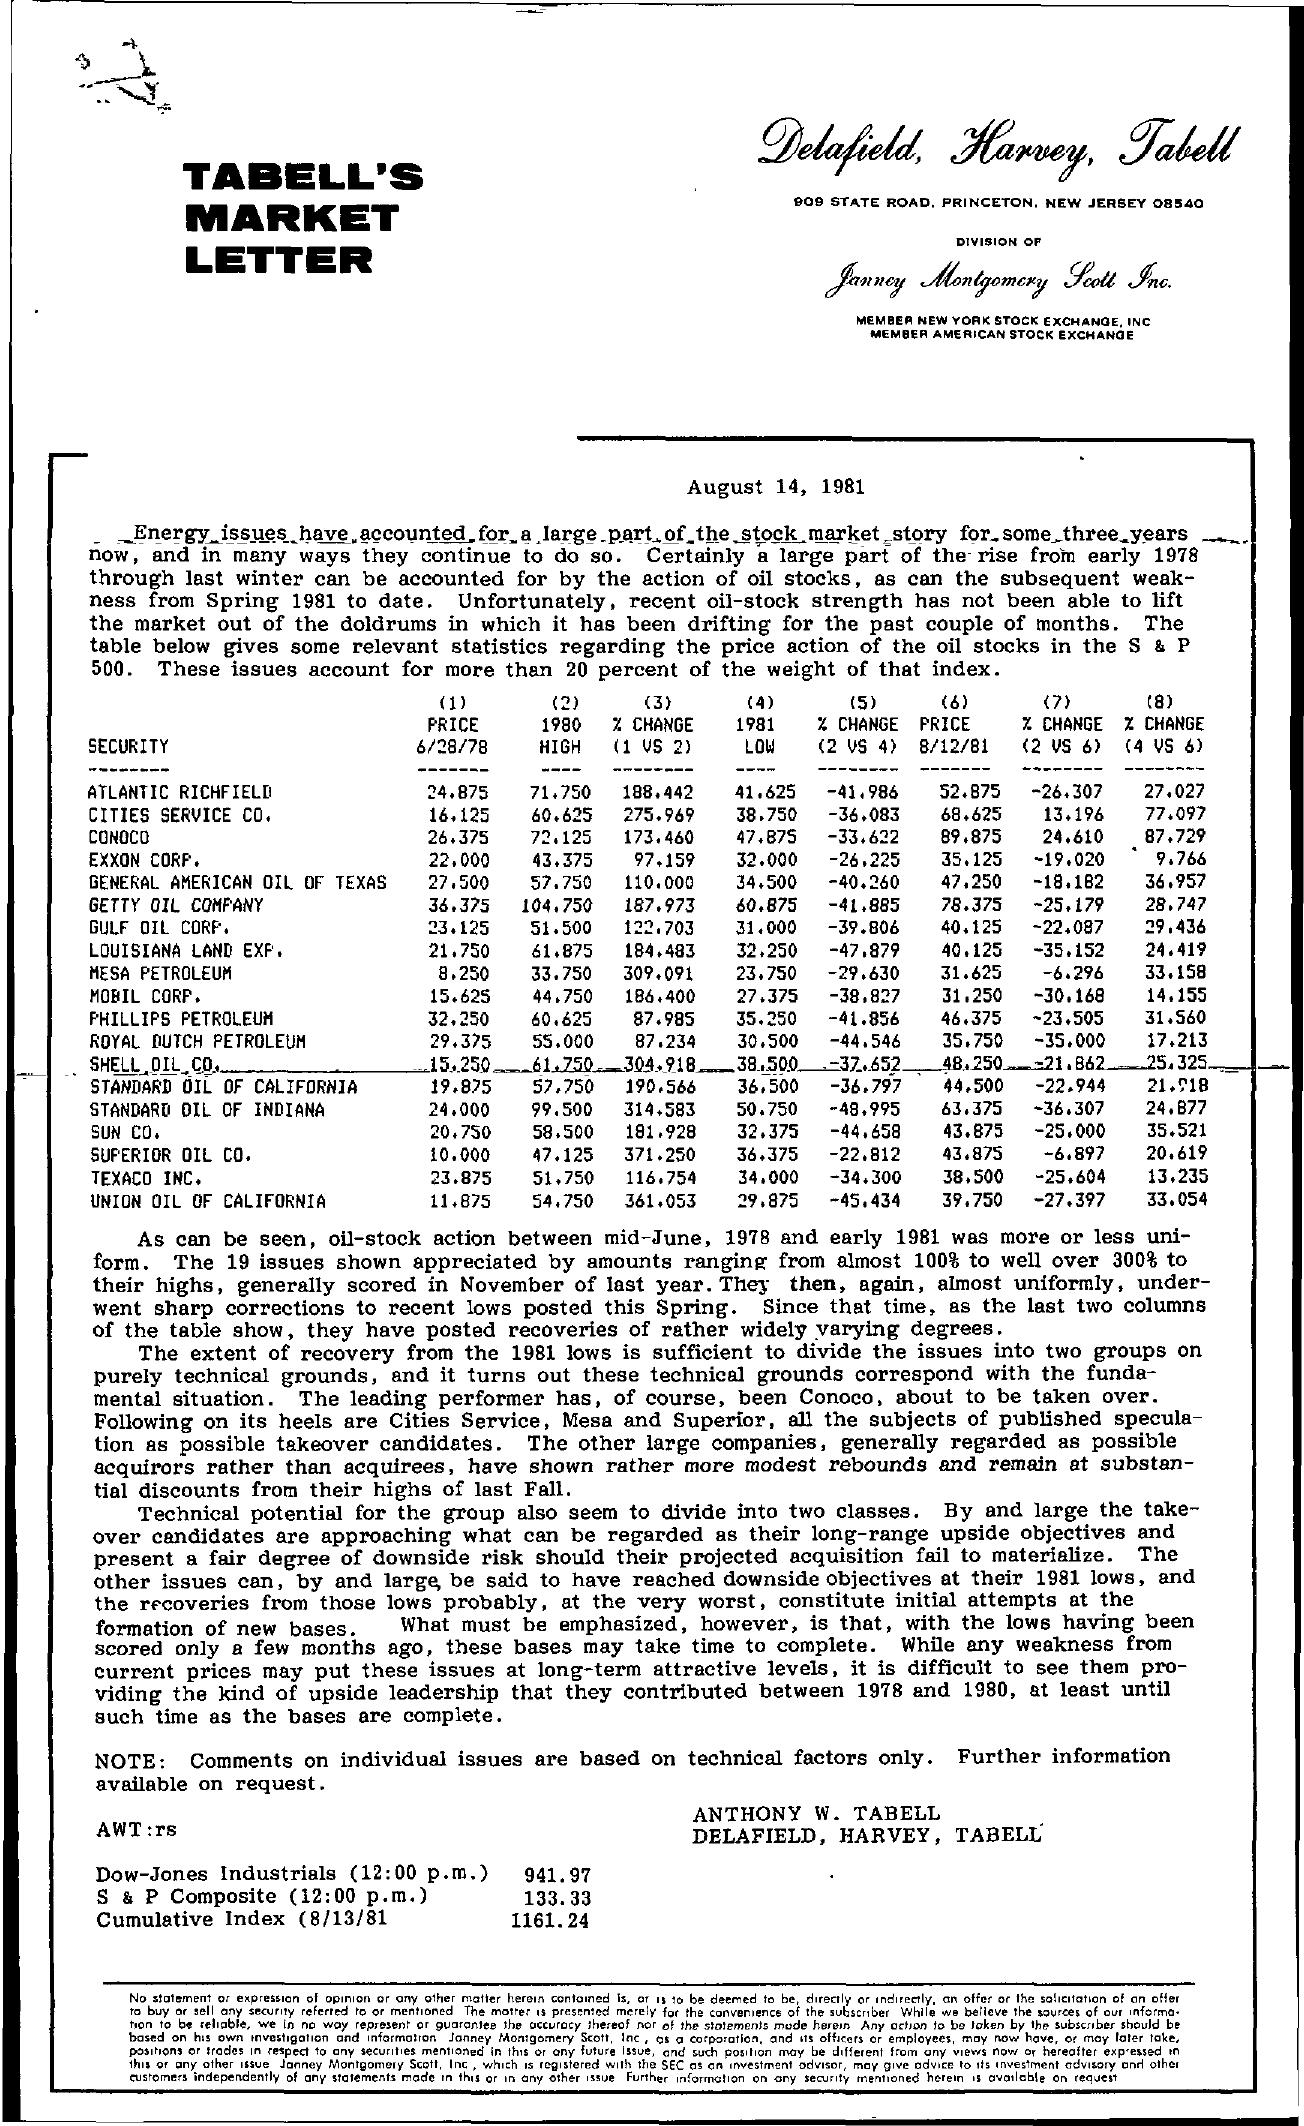 Tabell's Market Letter - August 14, 1981